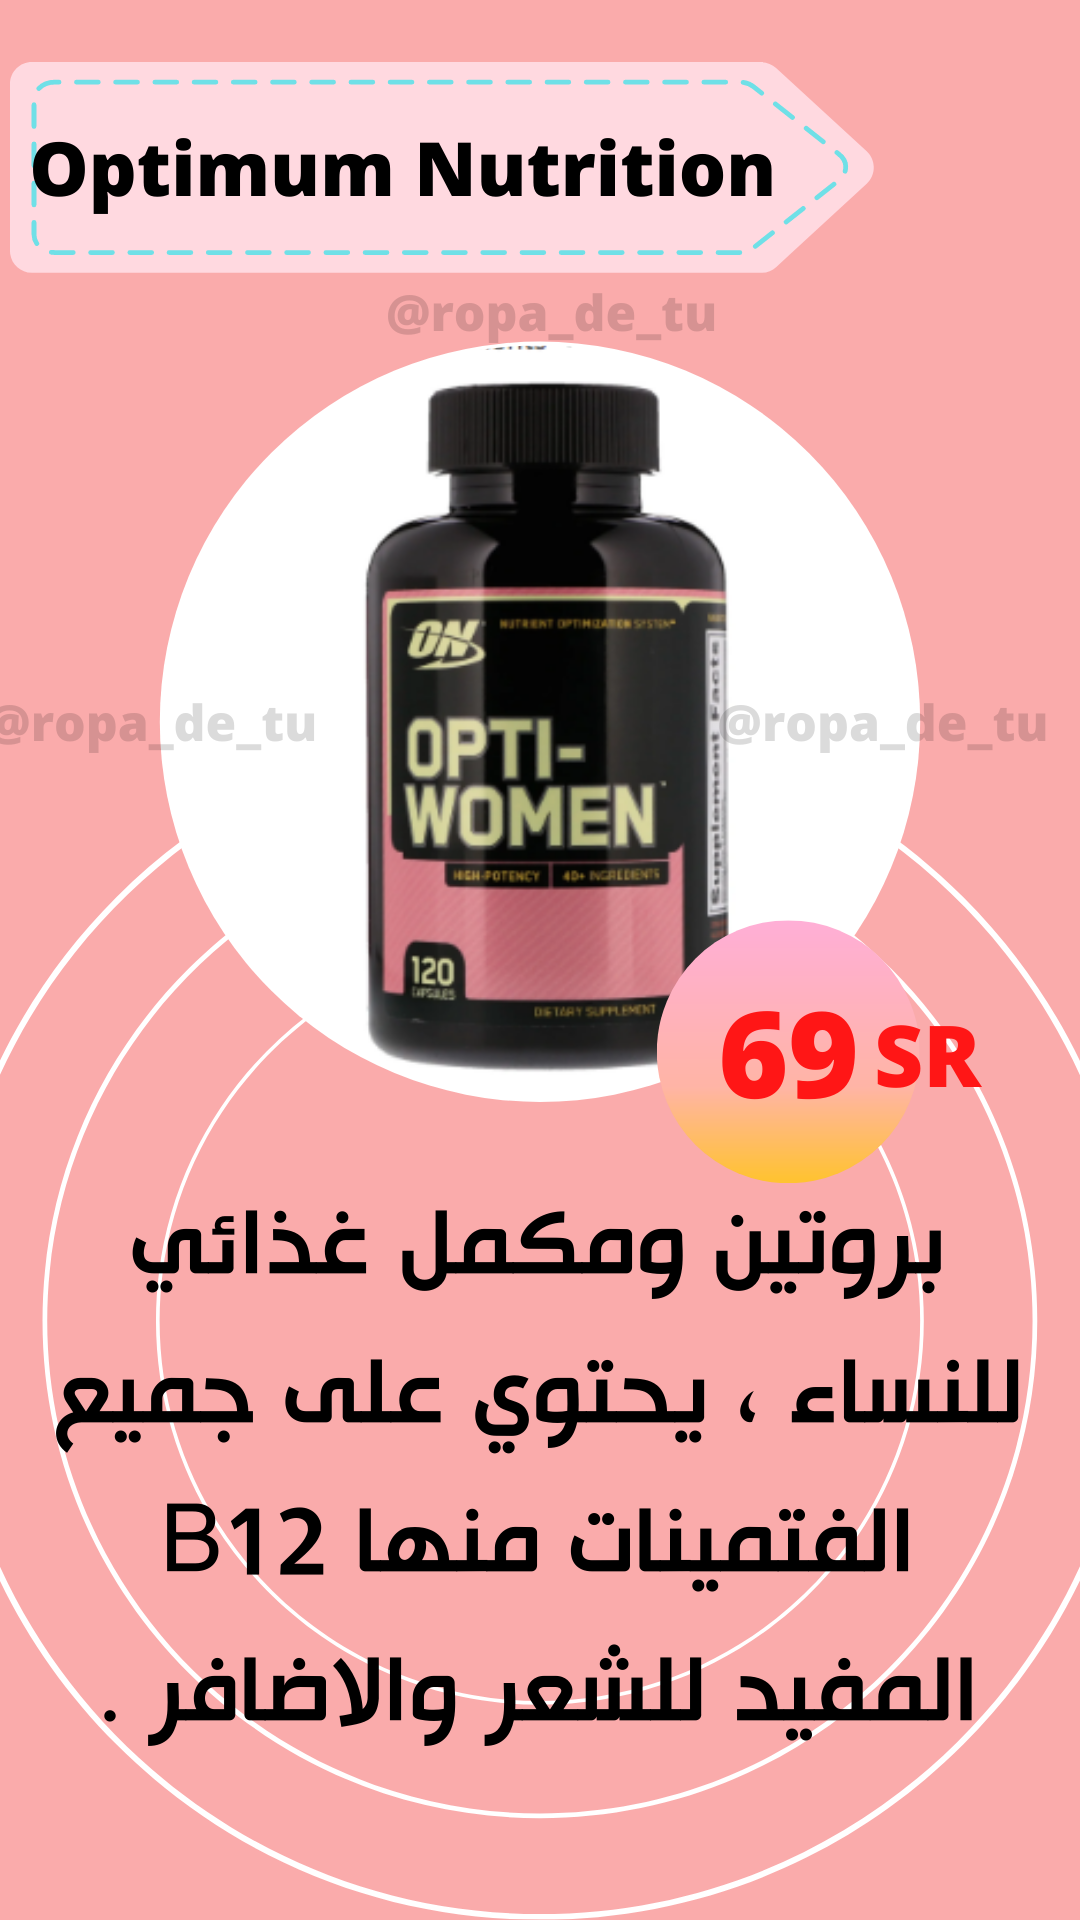 Optimum Nutrition Opti Women 120 كبسولة Optimum Nutrition Nutrition Women